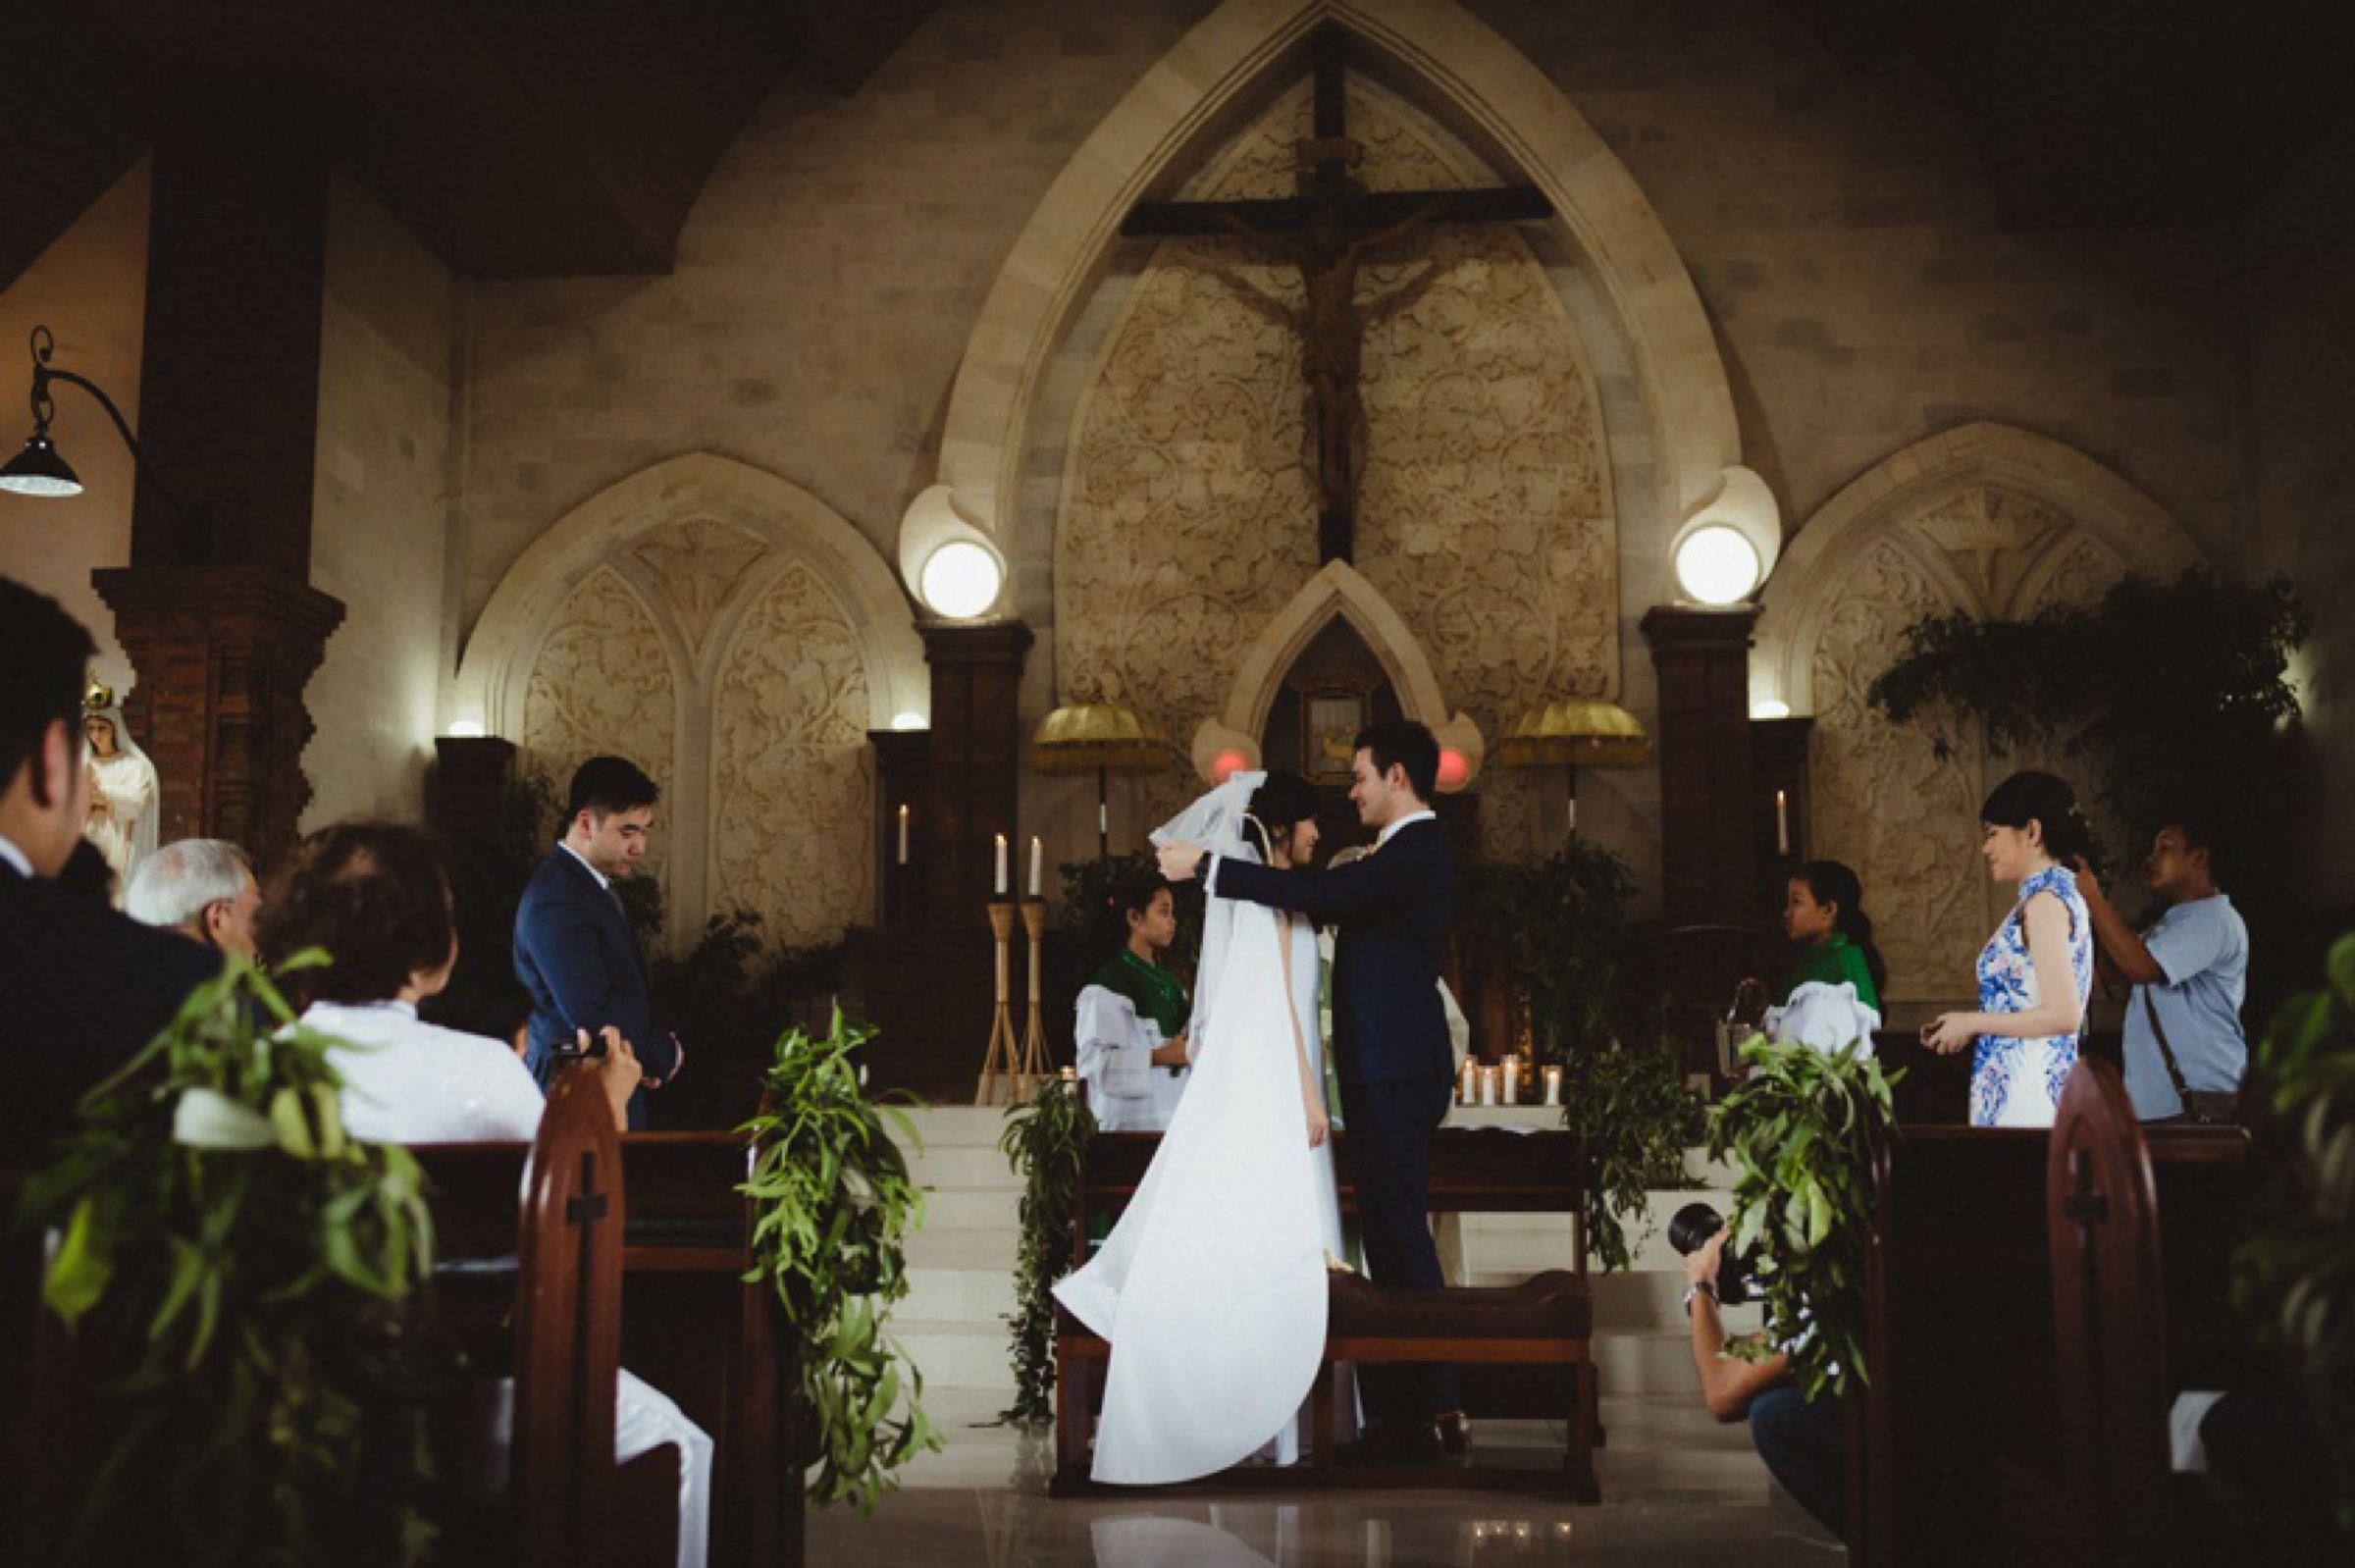 Tim-Danika-Bali-Wedding-Pyara-Photo-Evans 28.jpg